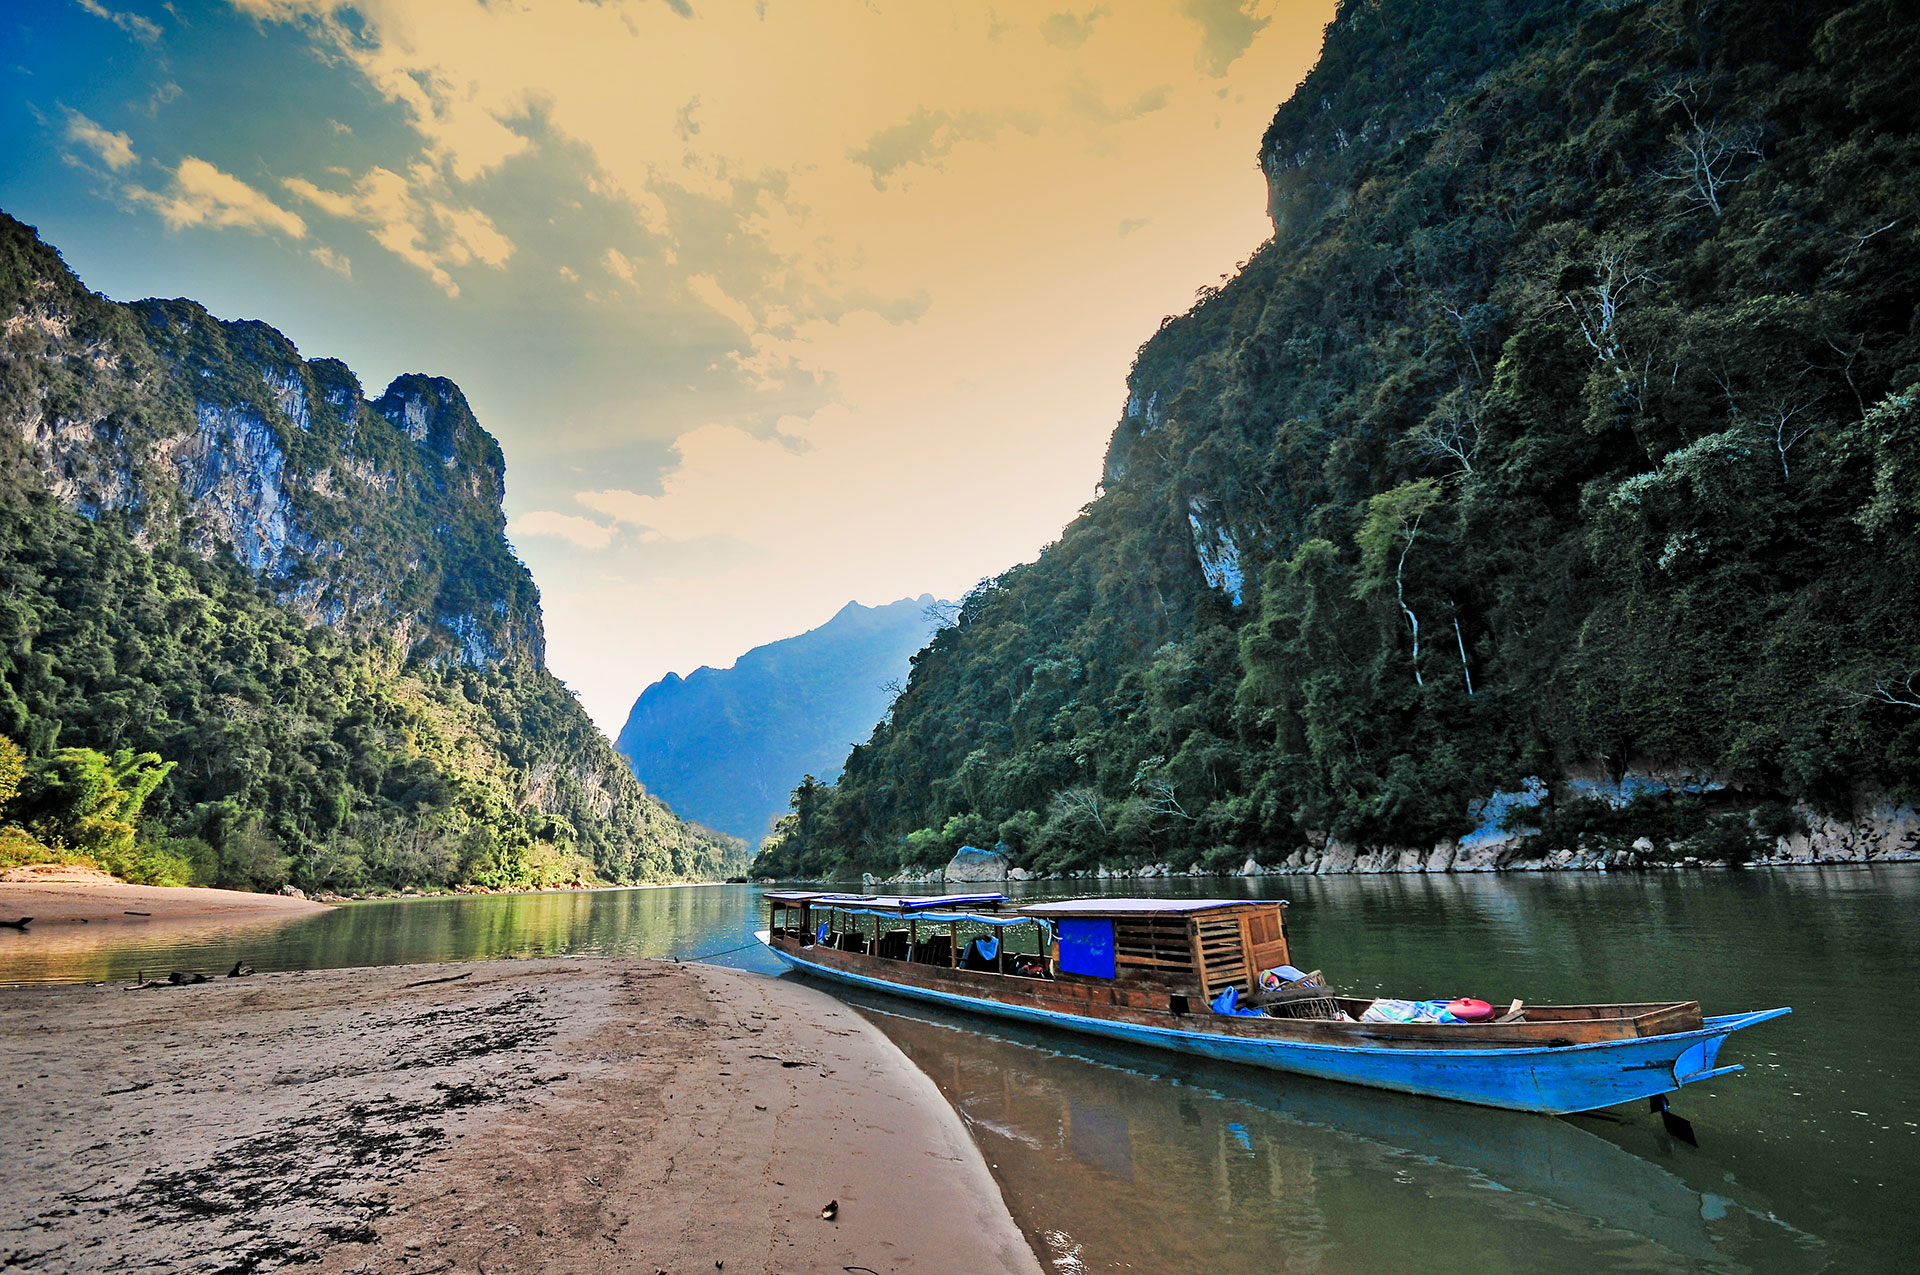 Muang La Lodge Nam Ou river Laos Travel